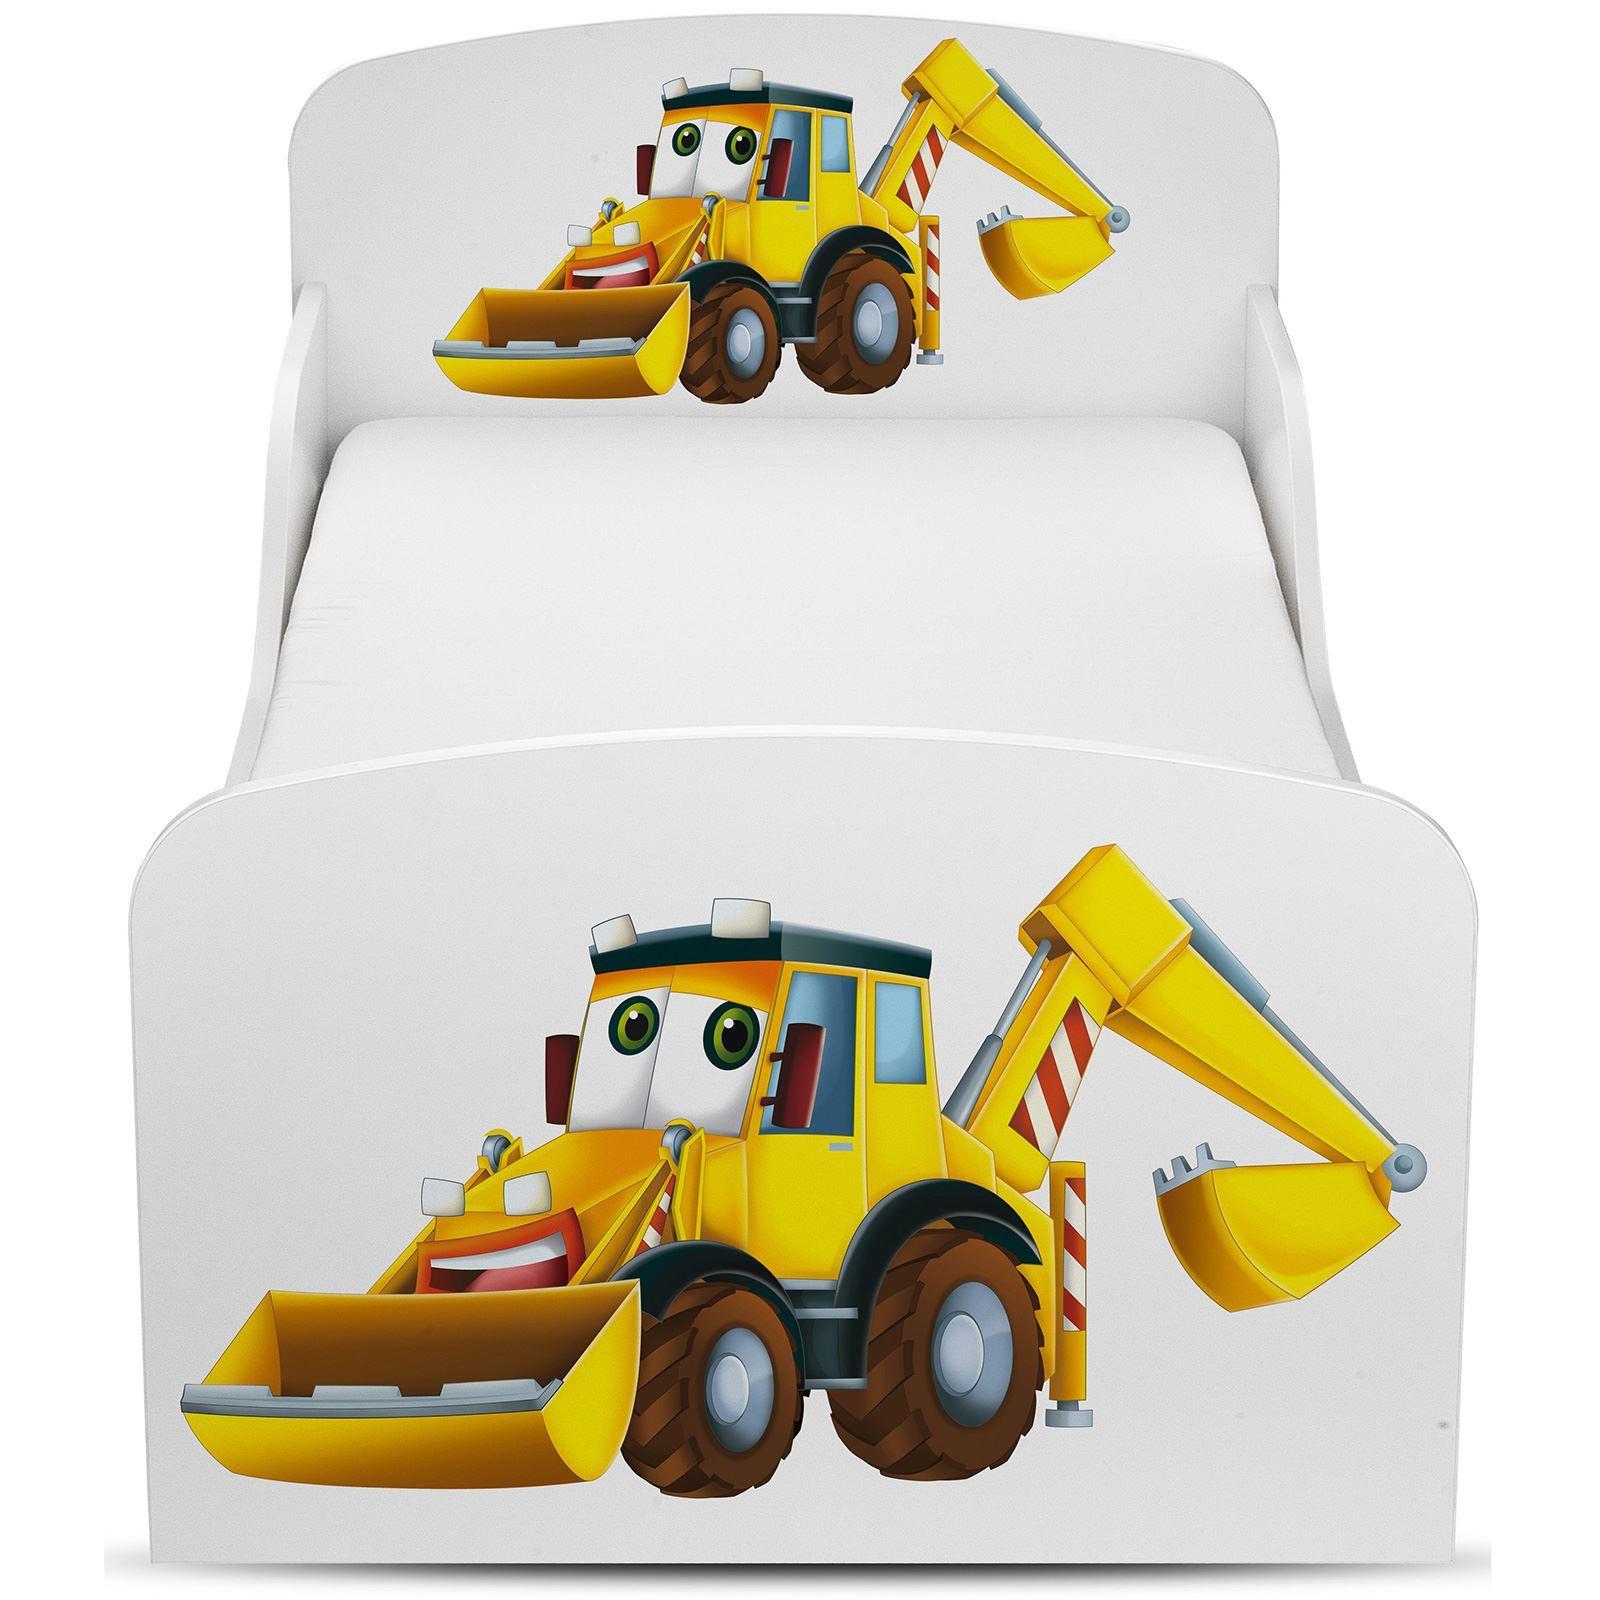 Price-Right-Home-Excavadoras-Cama-Infantil-con-o-Sin-Almacenaje-Colchon miniatura 10